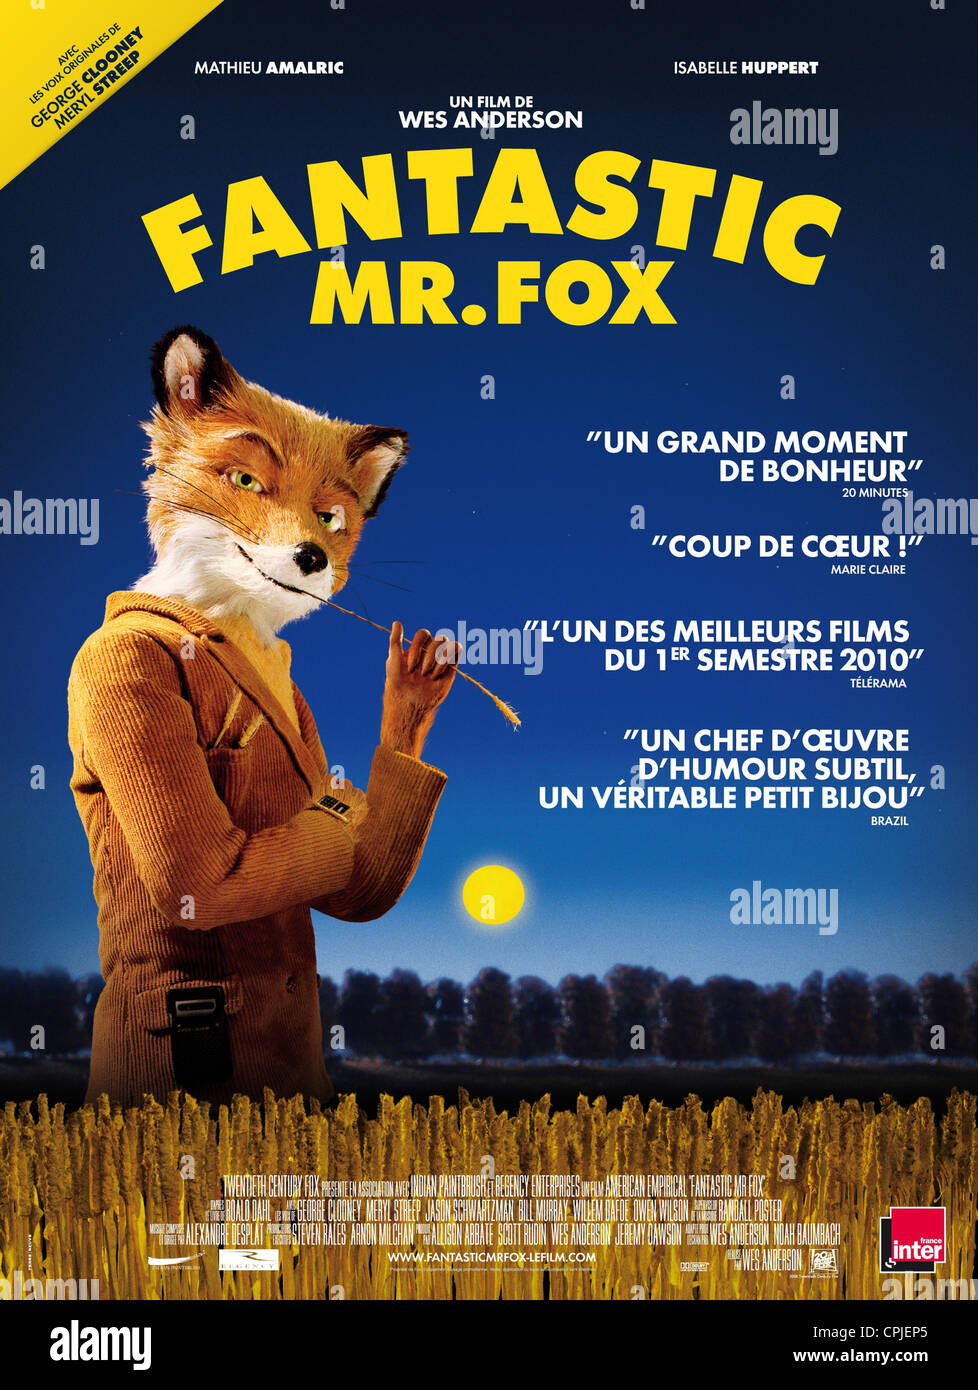 M. Fox fantastique Photo Stock